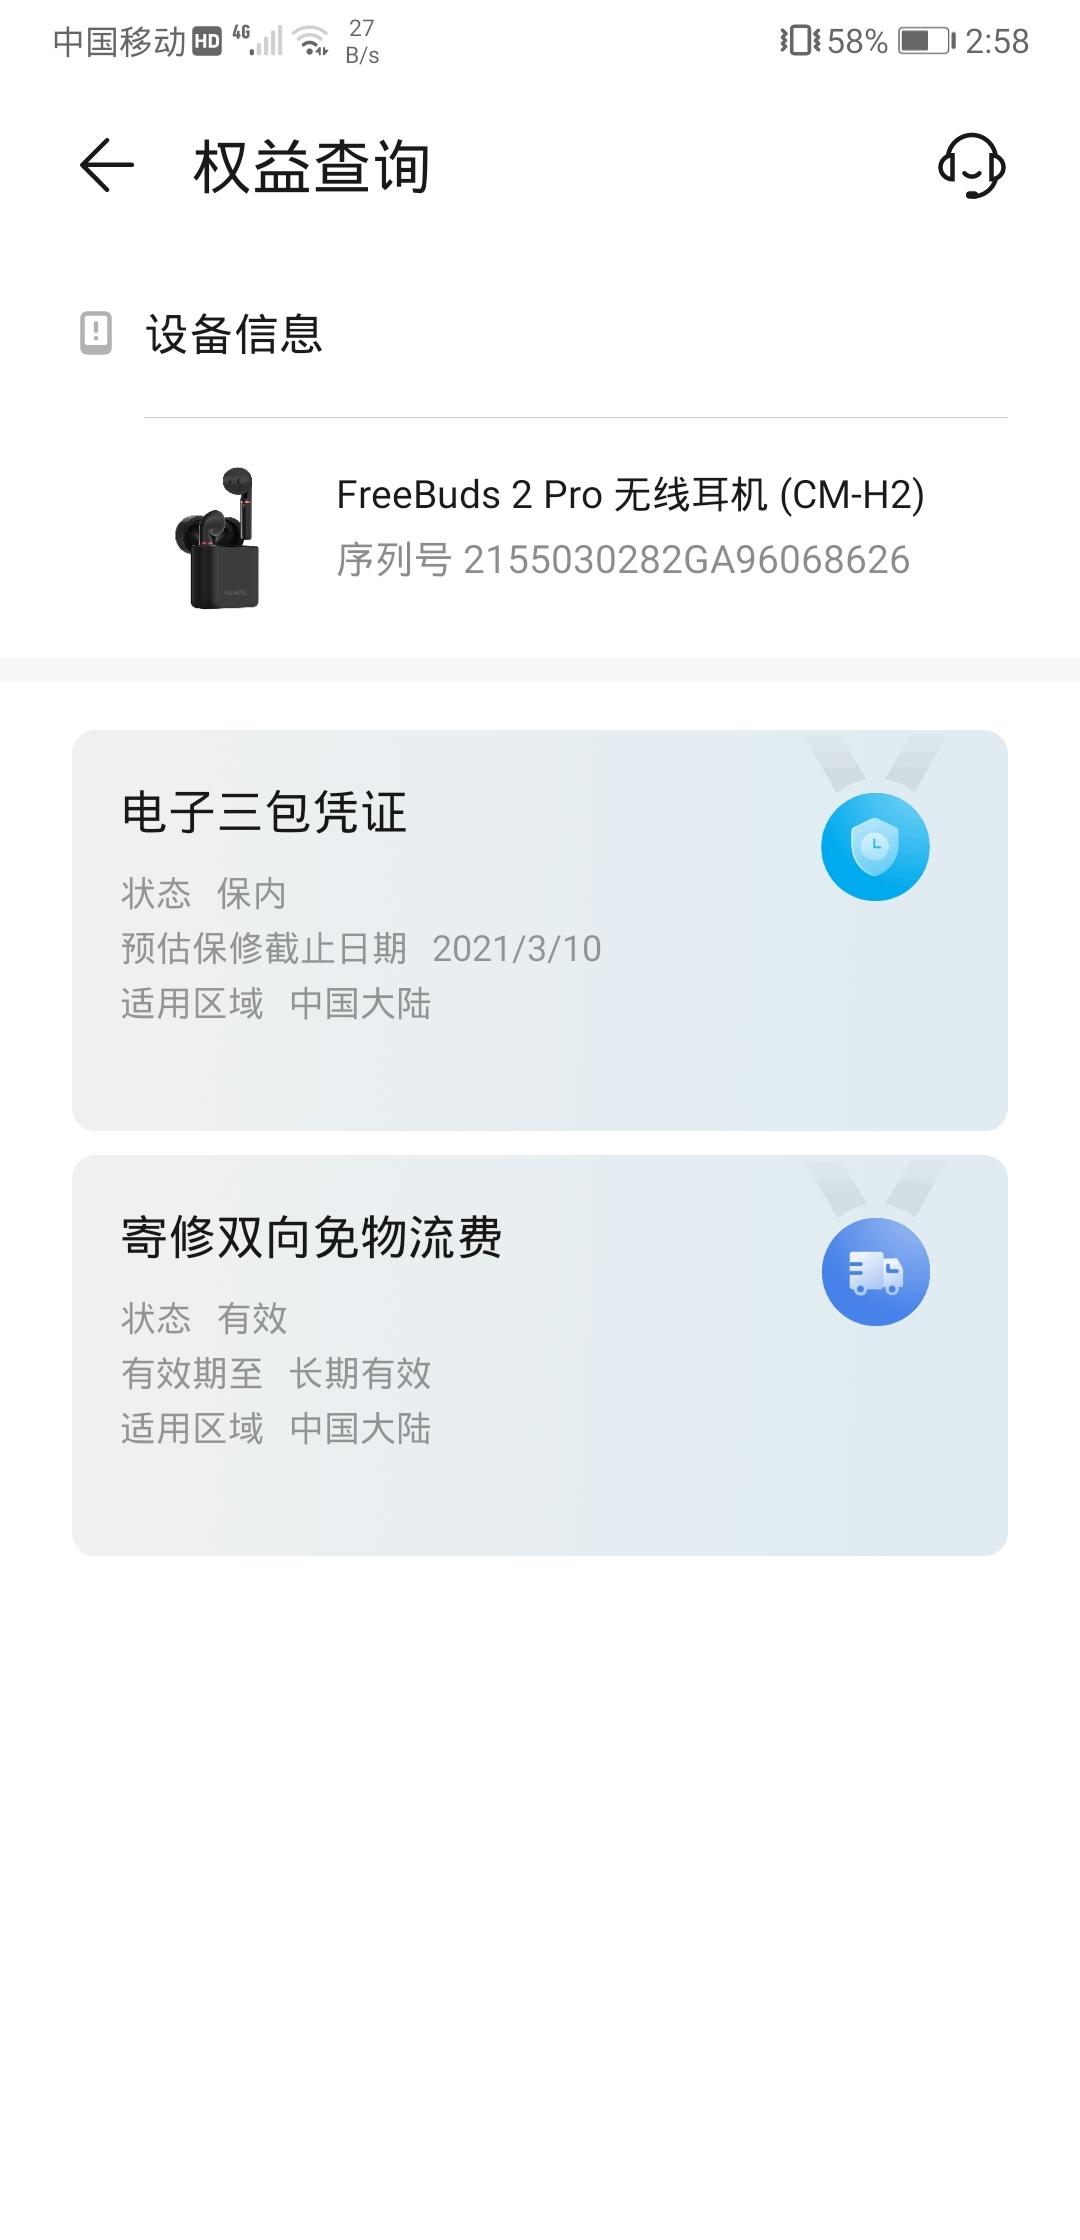 Screenshot_20200709_145853_com.huawei.phoneservice.jpg